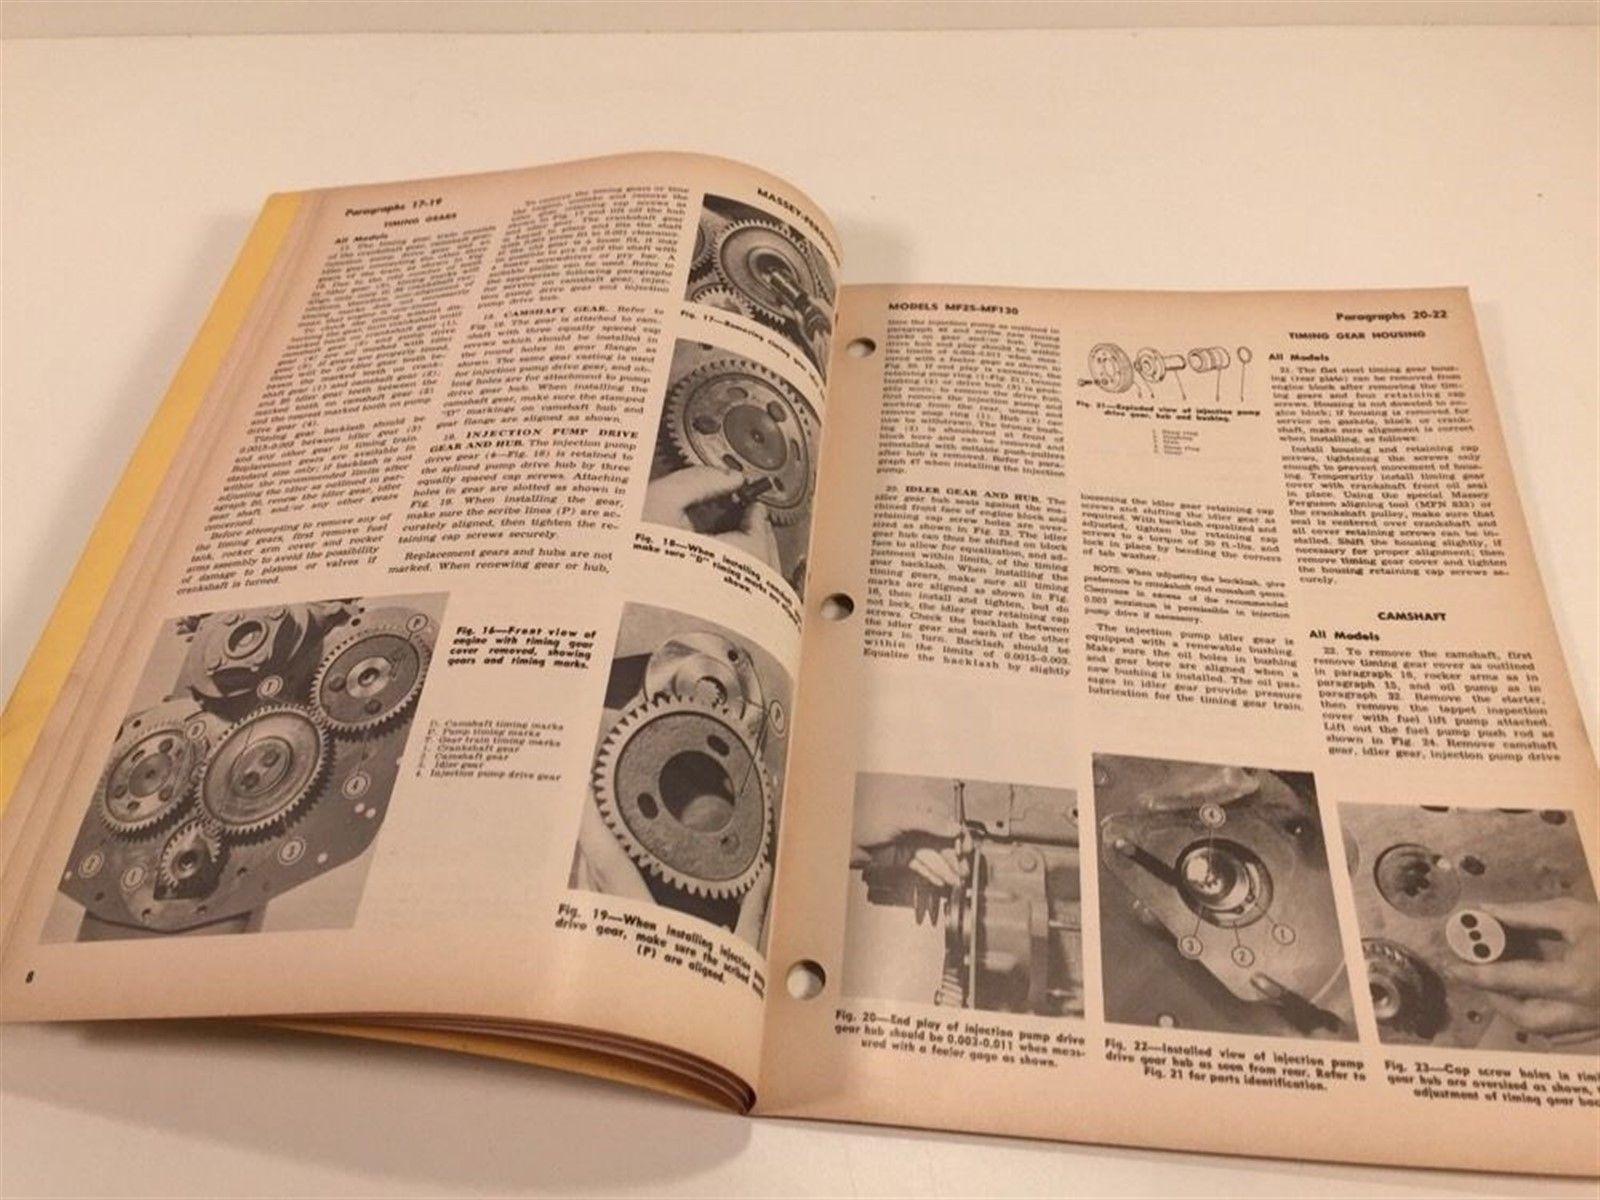 Vintage Implement & Tractor Shop Service Manual - Massey Ferguson MF25 MF130